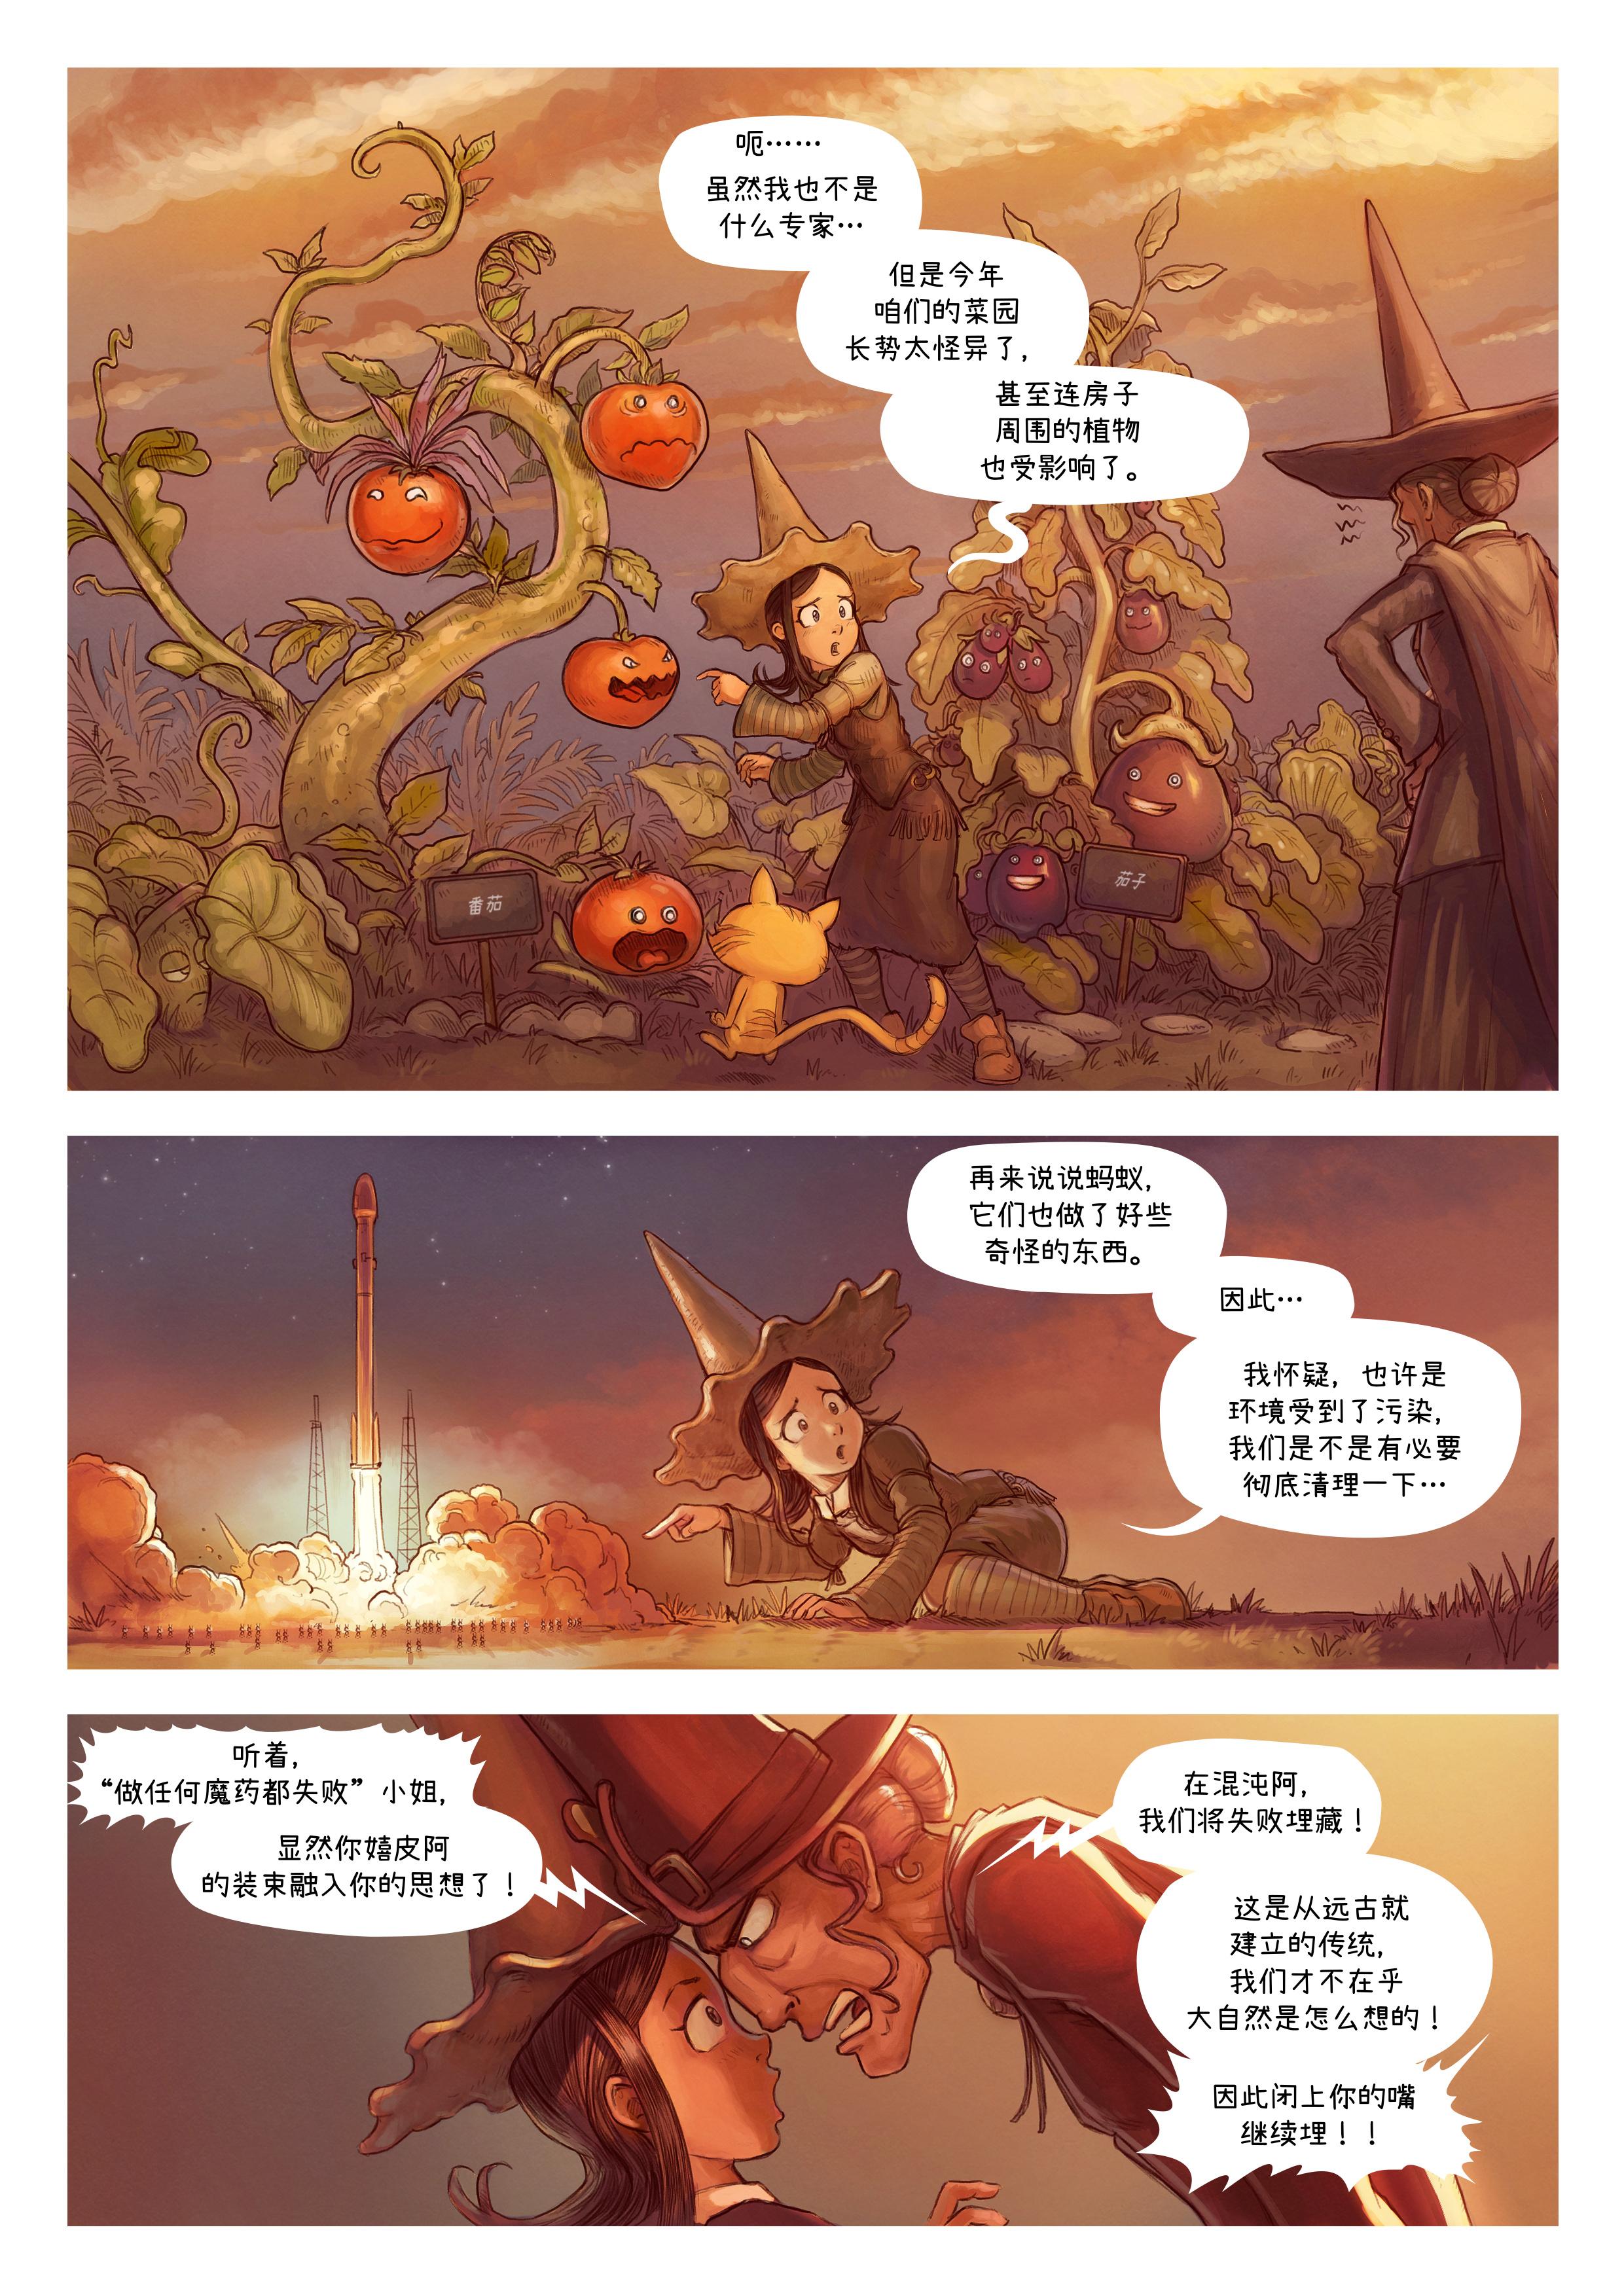 第19集:环境污染, Page 2